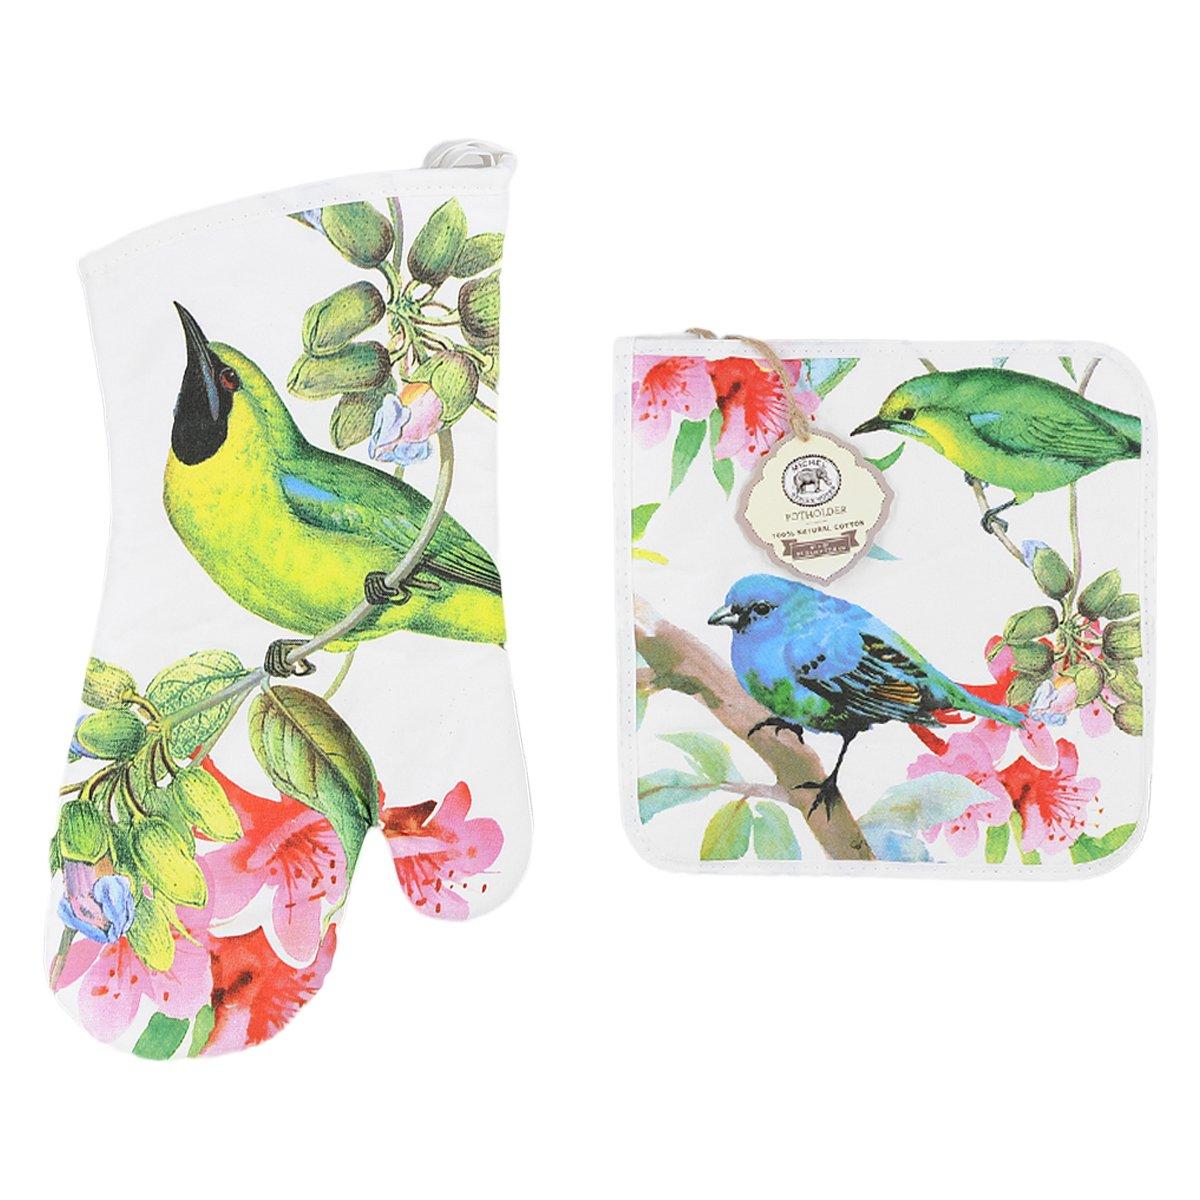 Michel Design Works Padded Cotton Oven Mitt & Cotton Potholder, Bird Song Bundle (2 Pack)